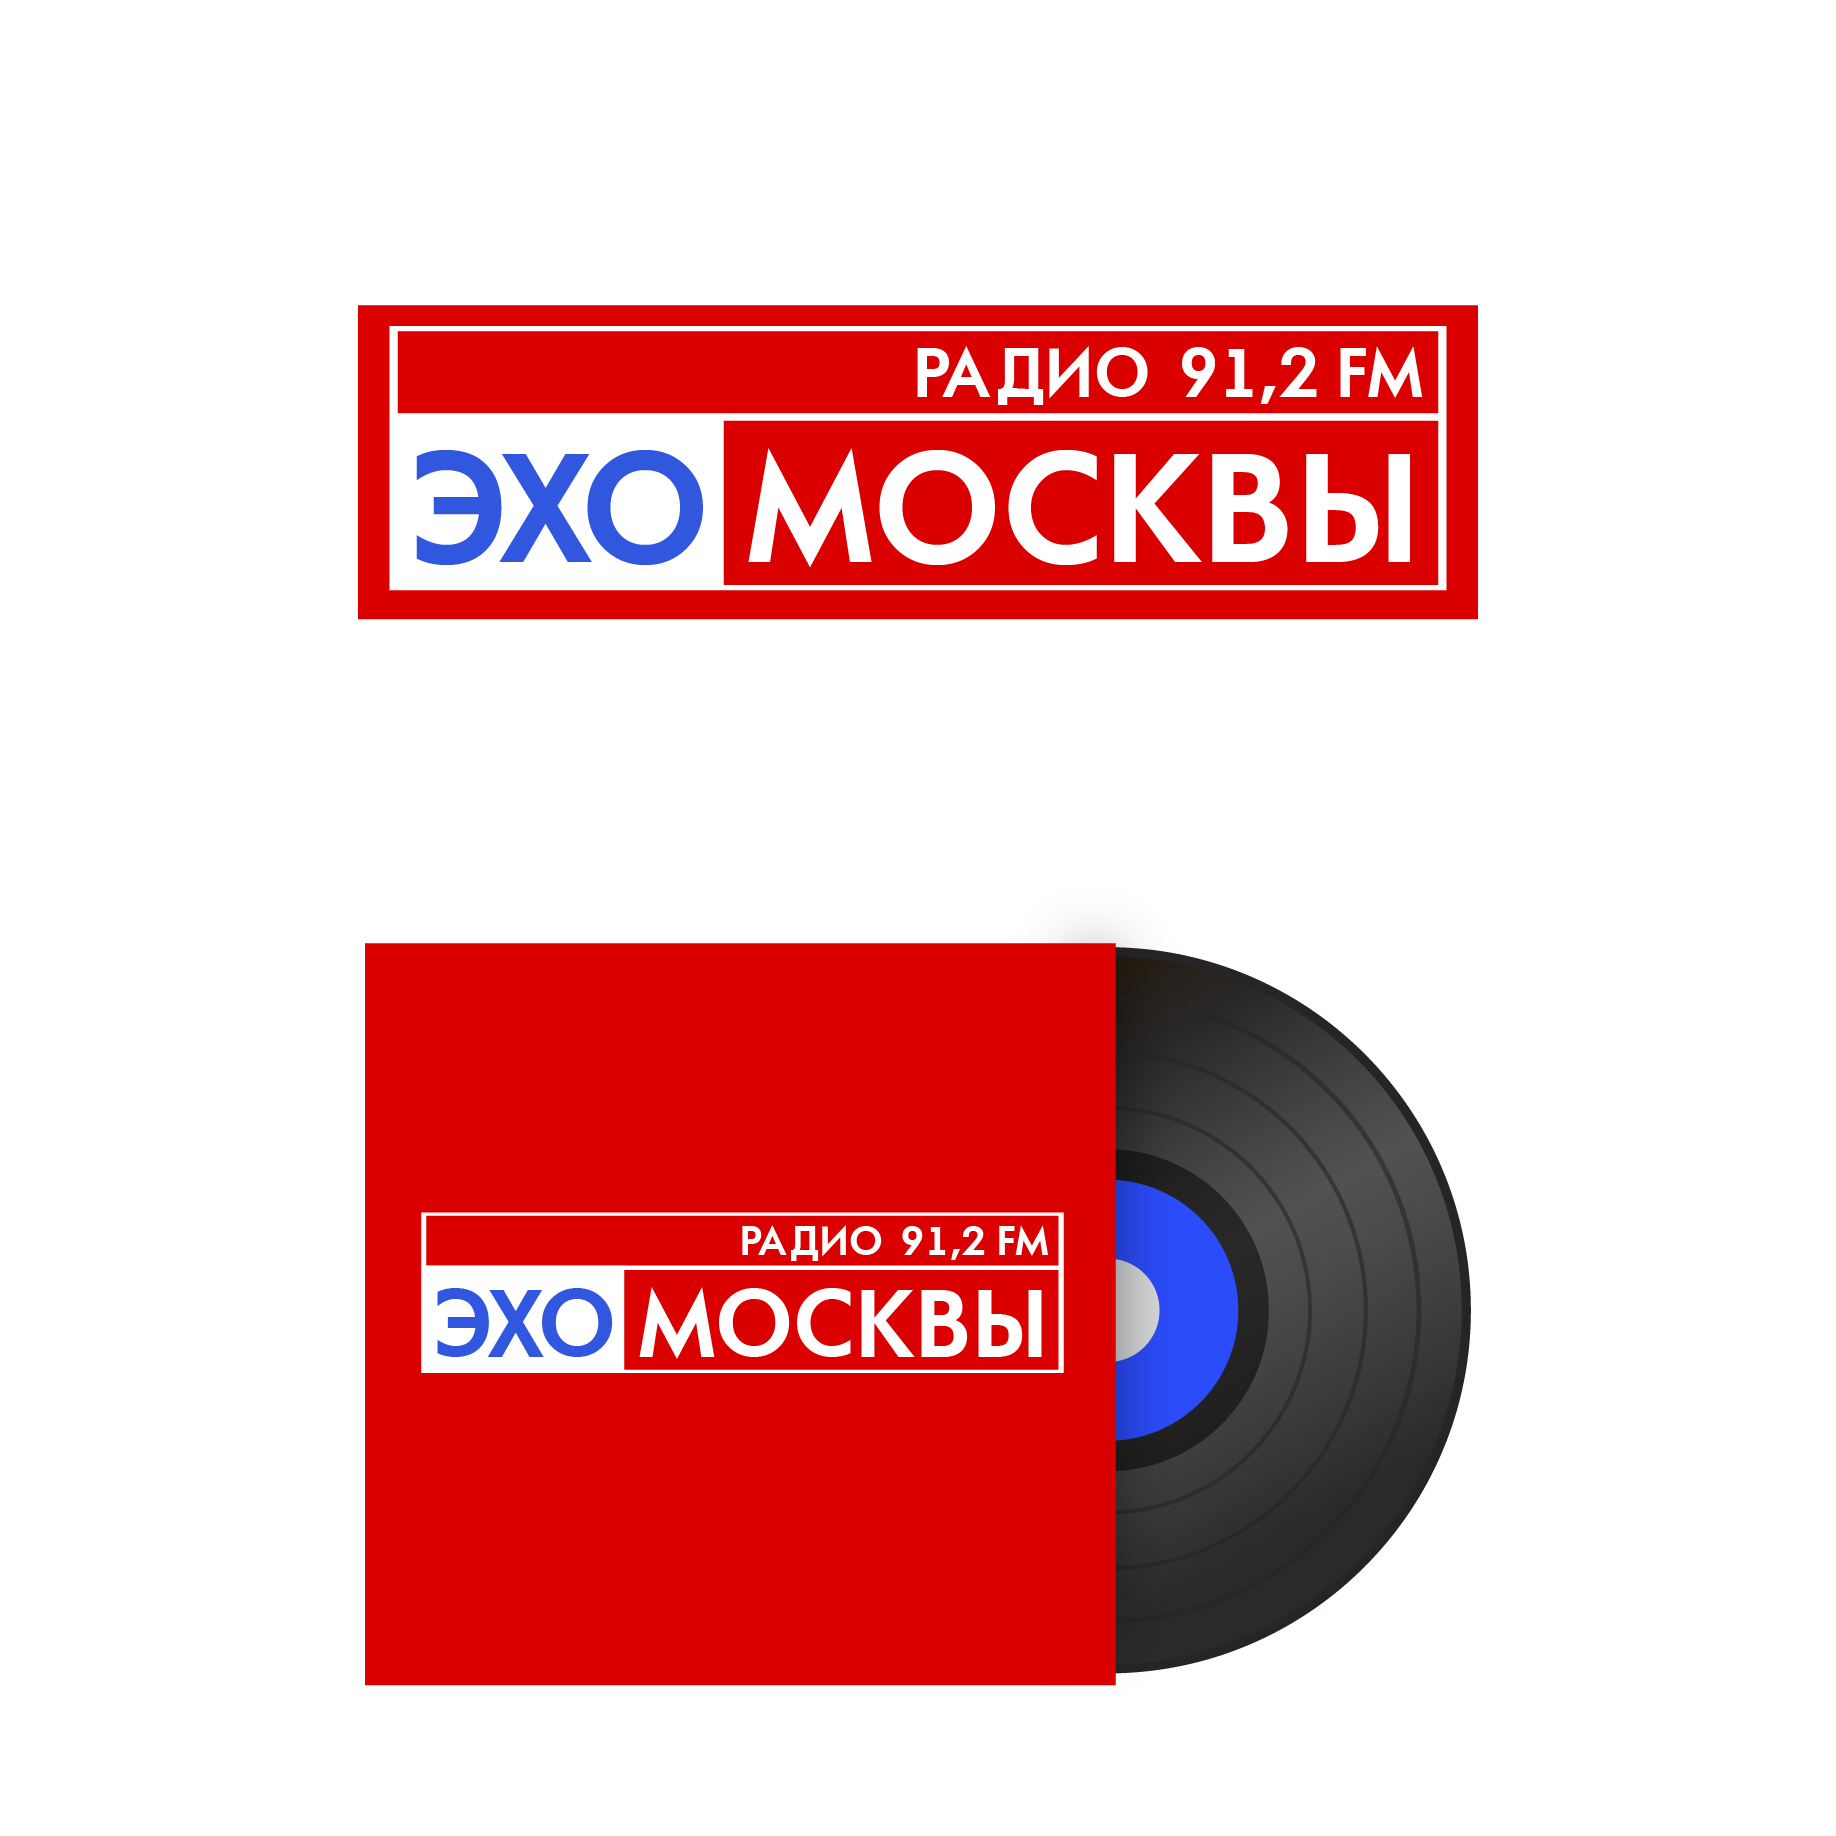 Дизайн логотипа р/с Эхо Москвы. фото f_0715627725228ccf.jpg